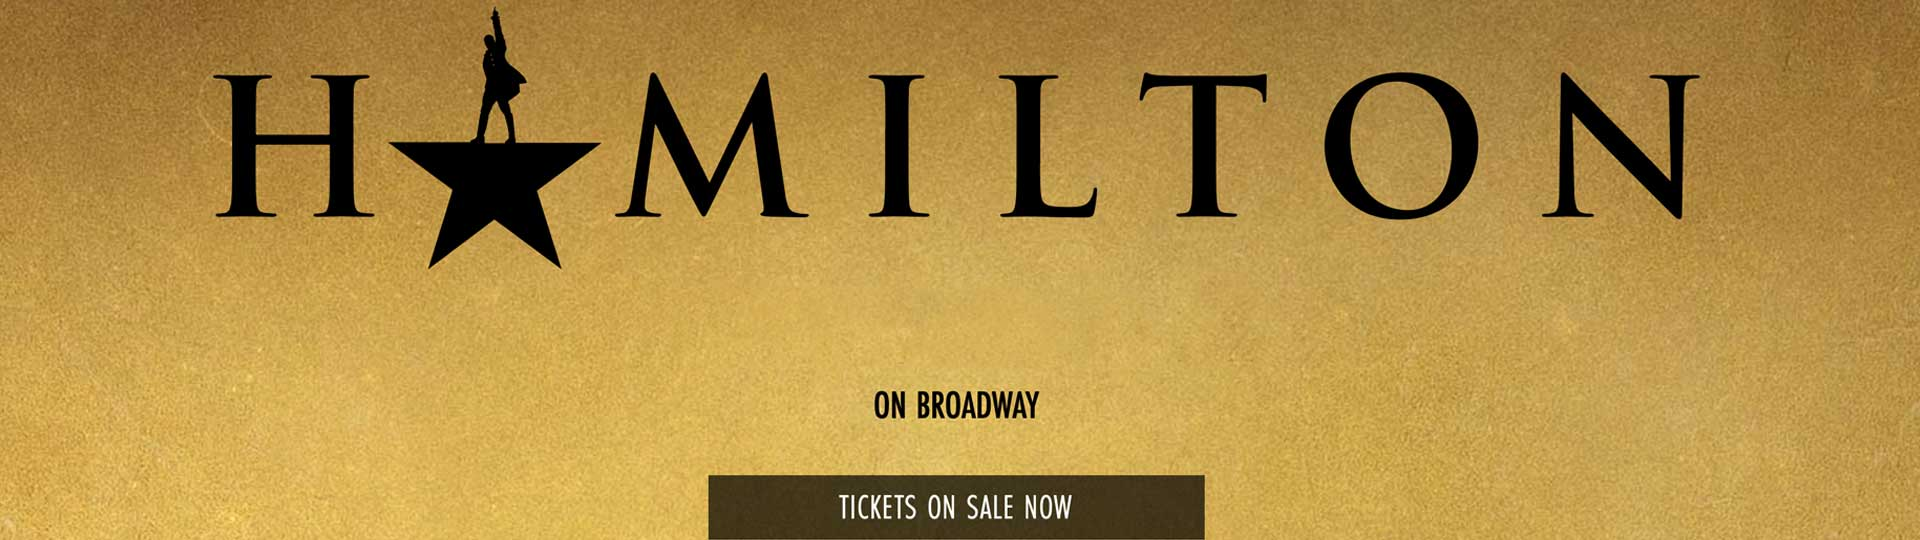 Stubhub tickets for Hamilton